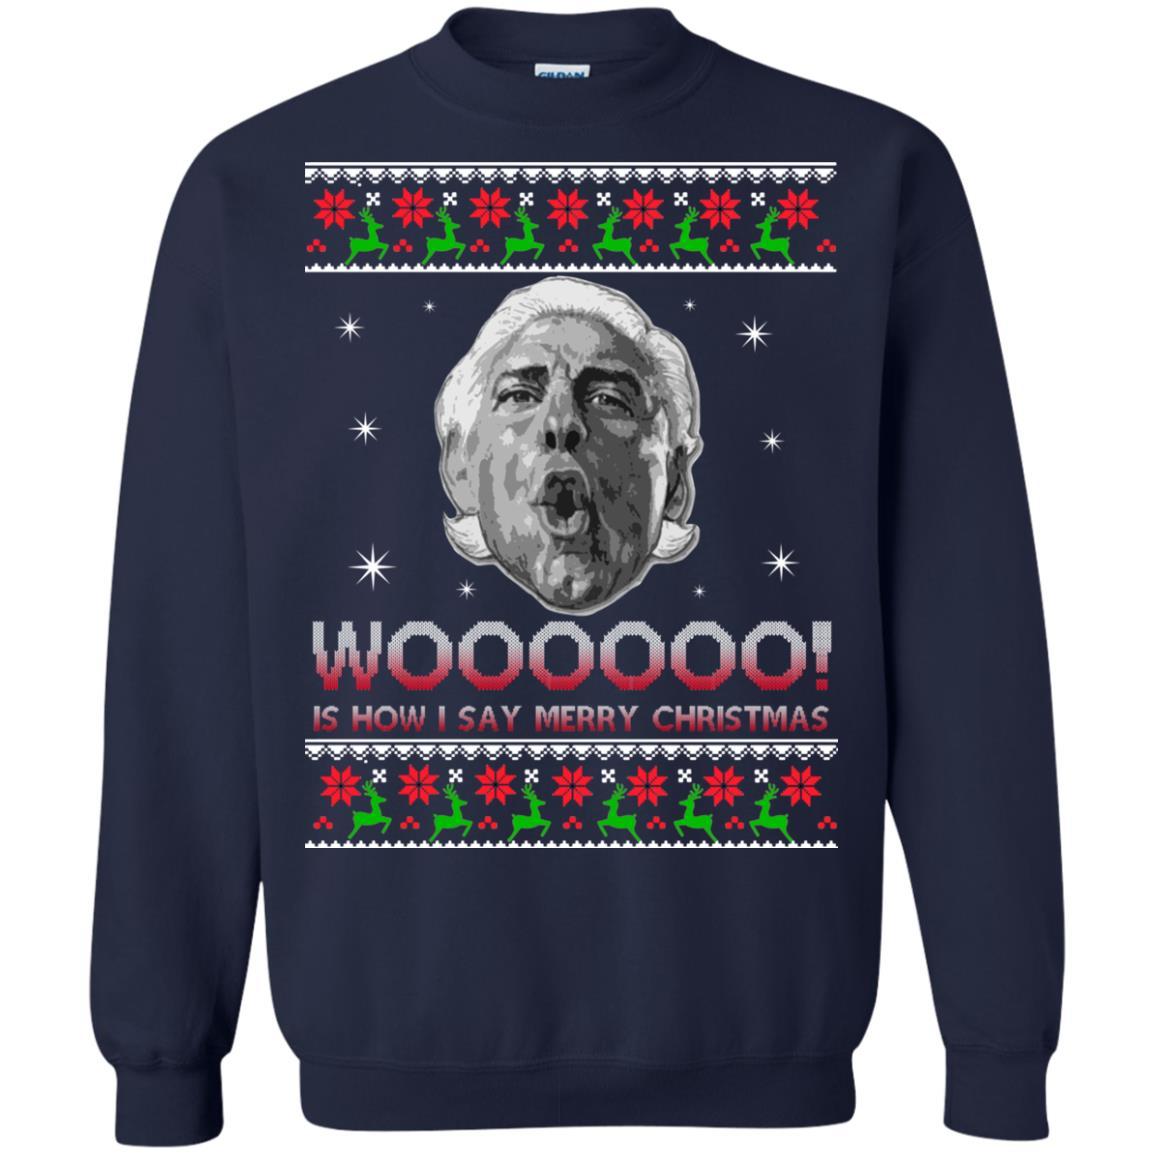 image 1225 - Ric Flair Woo Christmas Sweater, Ugly Sweatshirt, Hoodie